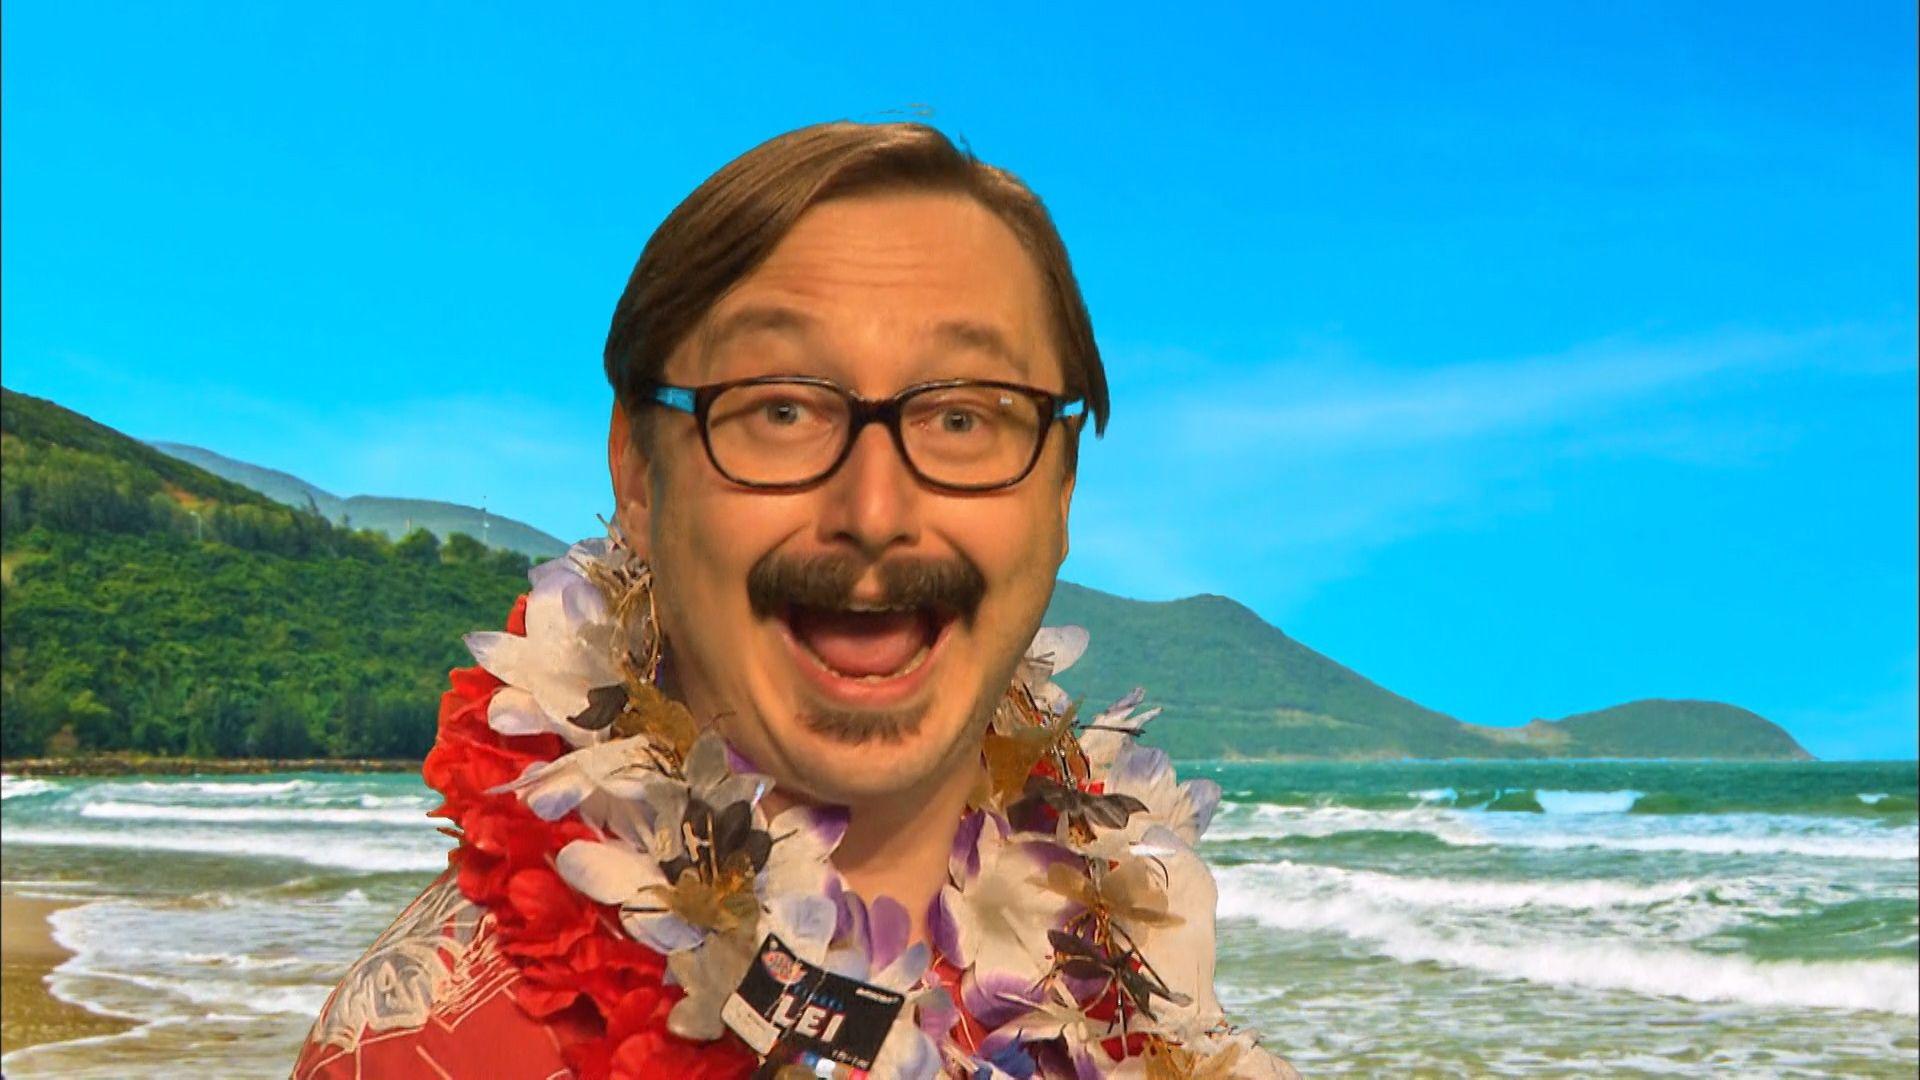 john hodgman daily show